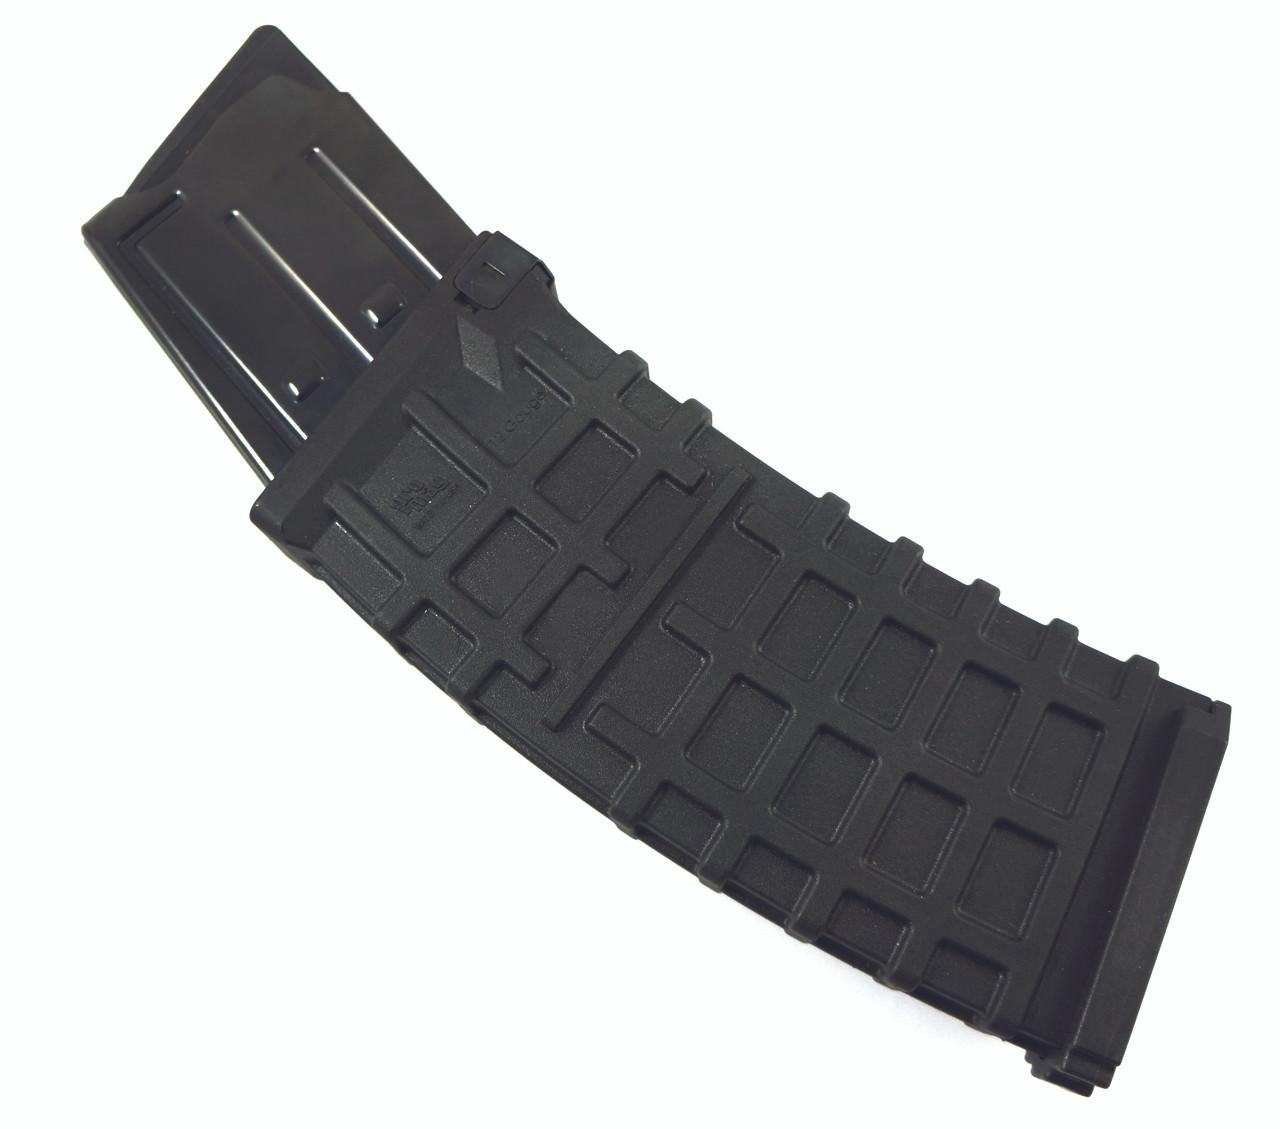 "Akdal® MKA 1919® 12 Gauge 2-3/4"" (10) Rd - Black Polymer"